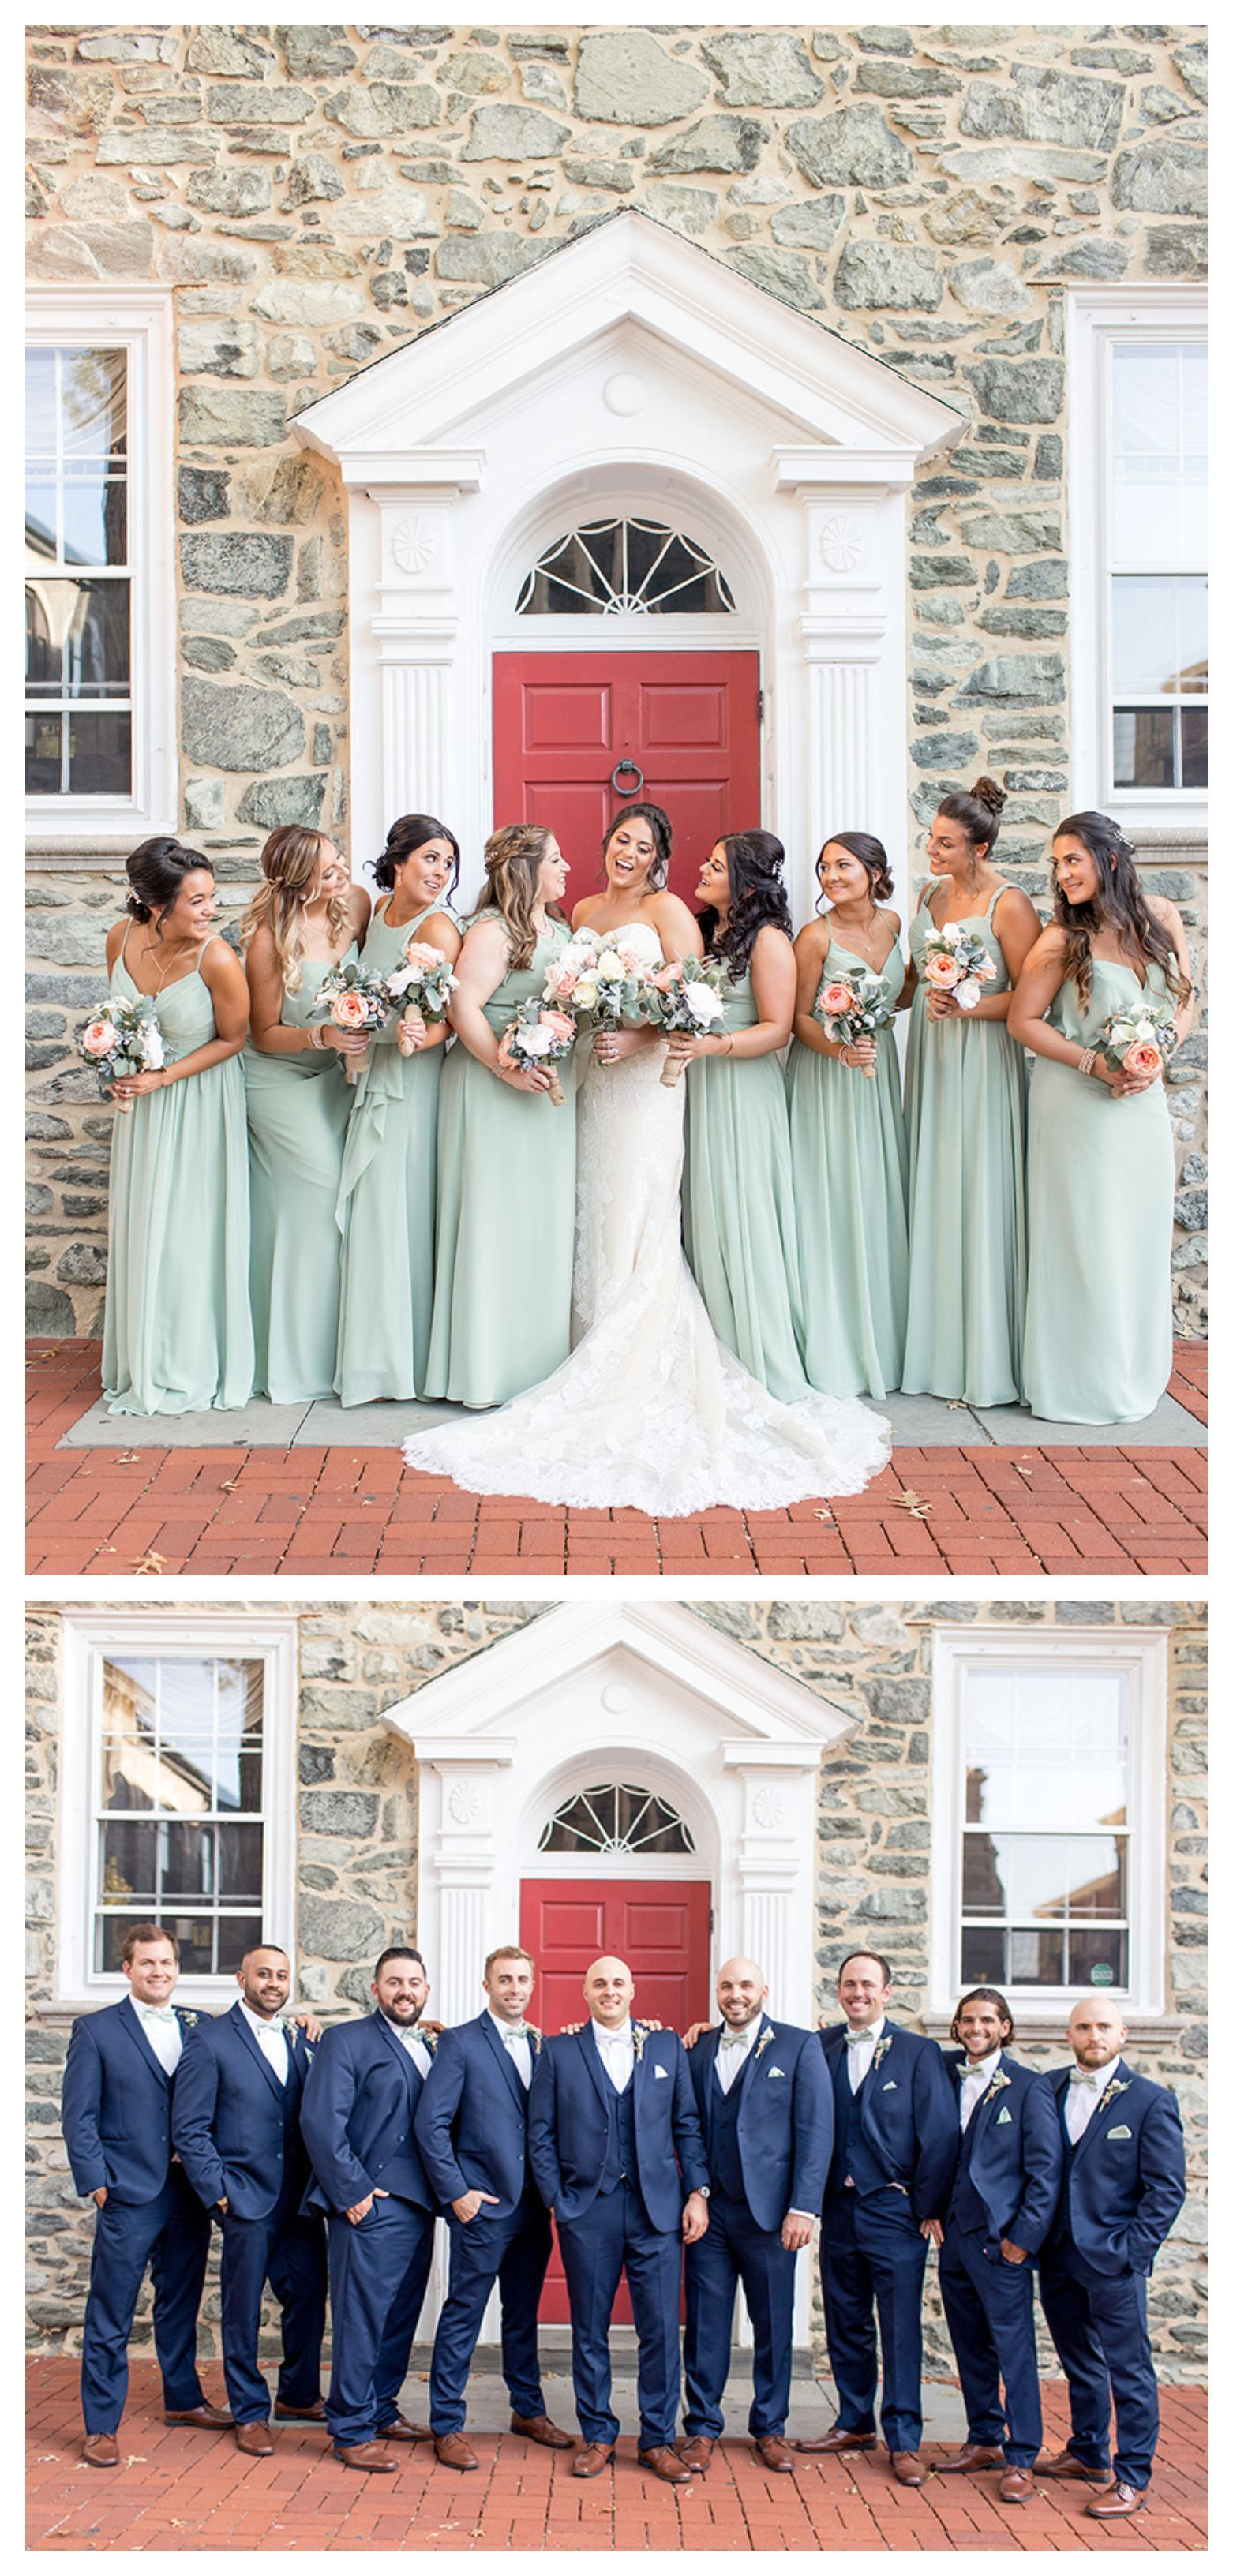 Light Green Bridesmaid Dresses And Navy Groomsmen Penn Oaks Golf Course Light Green Bridesmaid Dresses Sage Green Bridesmaid Dress Summer Bridesmaid Dresses [ 3264 x 1562 Pixel ]